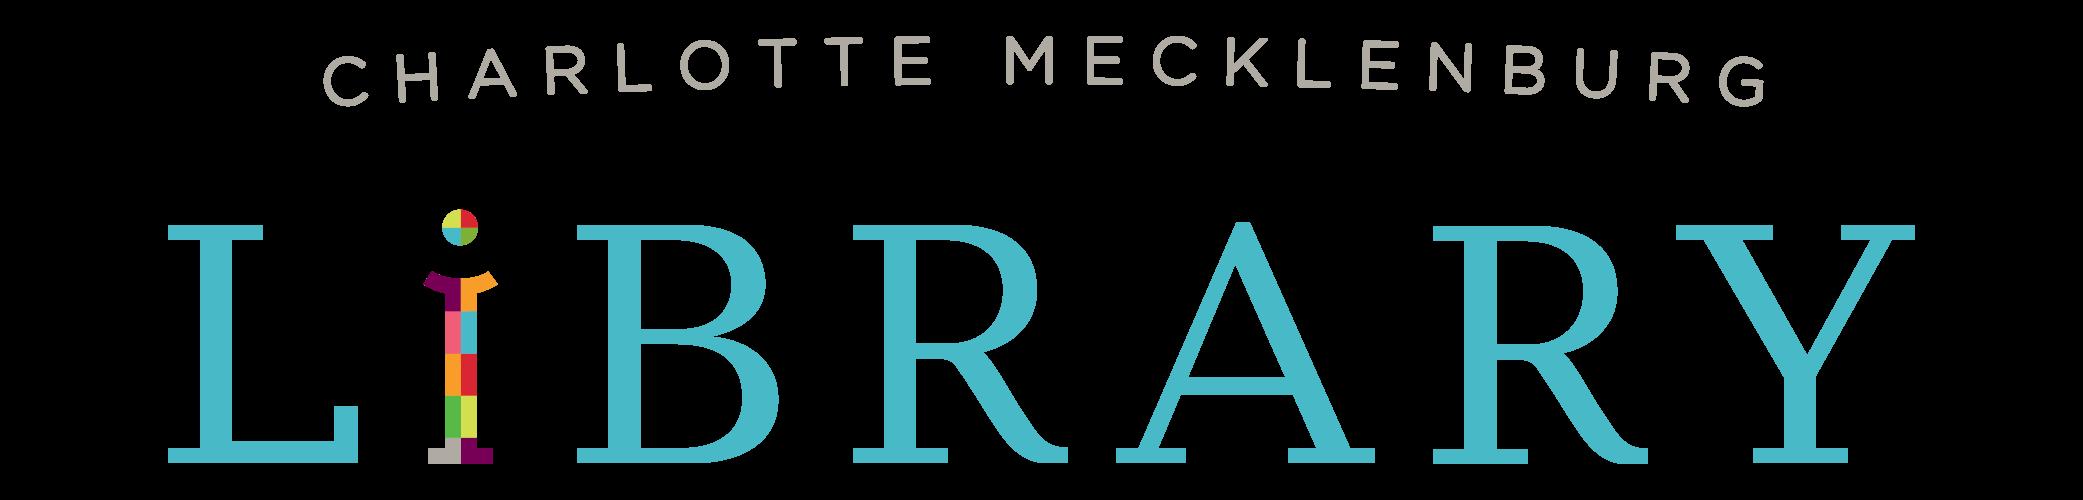 Charlotte Mecklenburg Library Logo